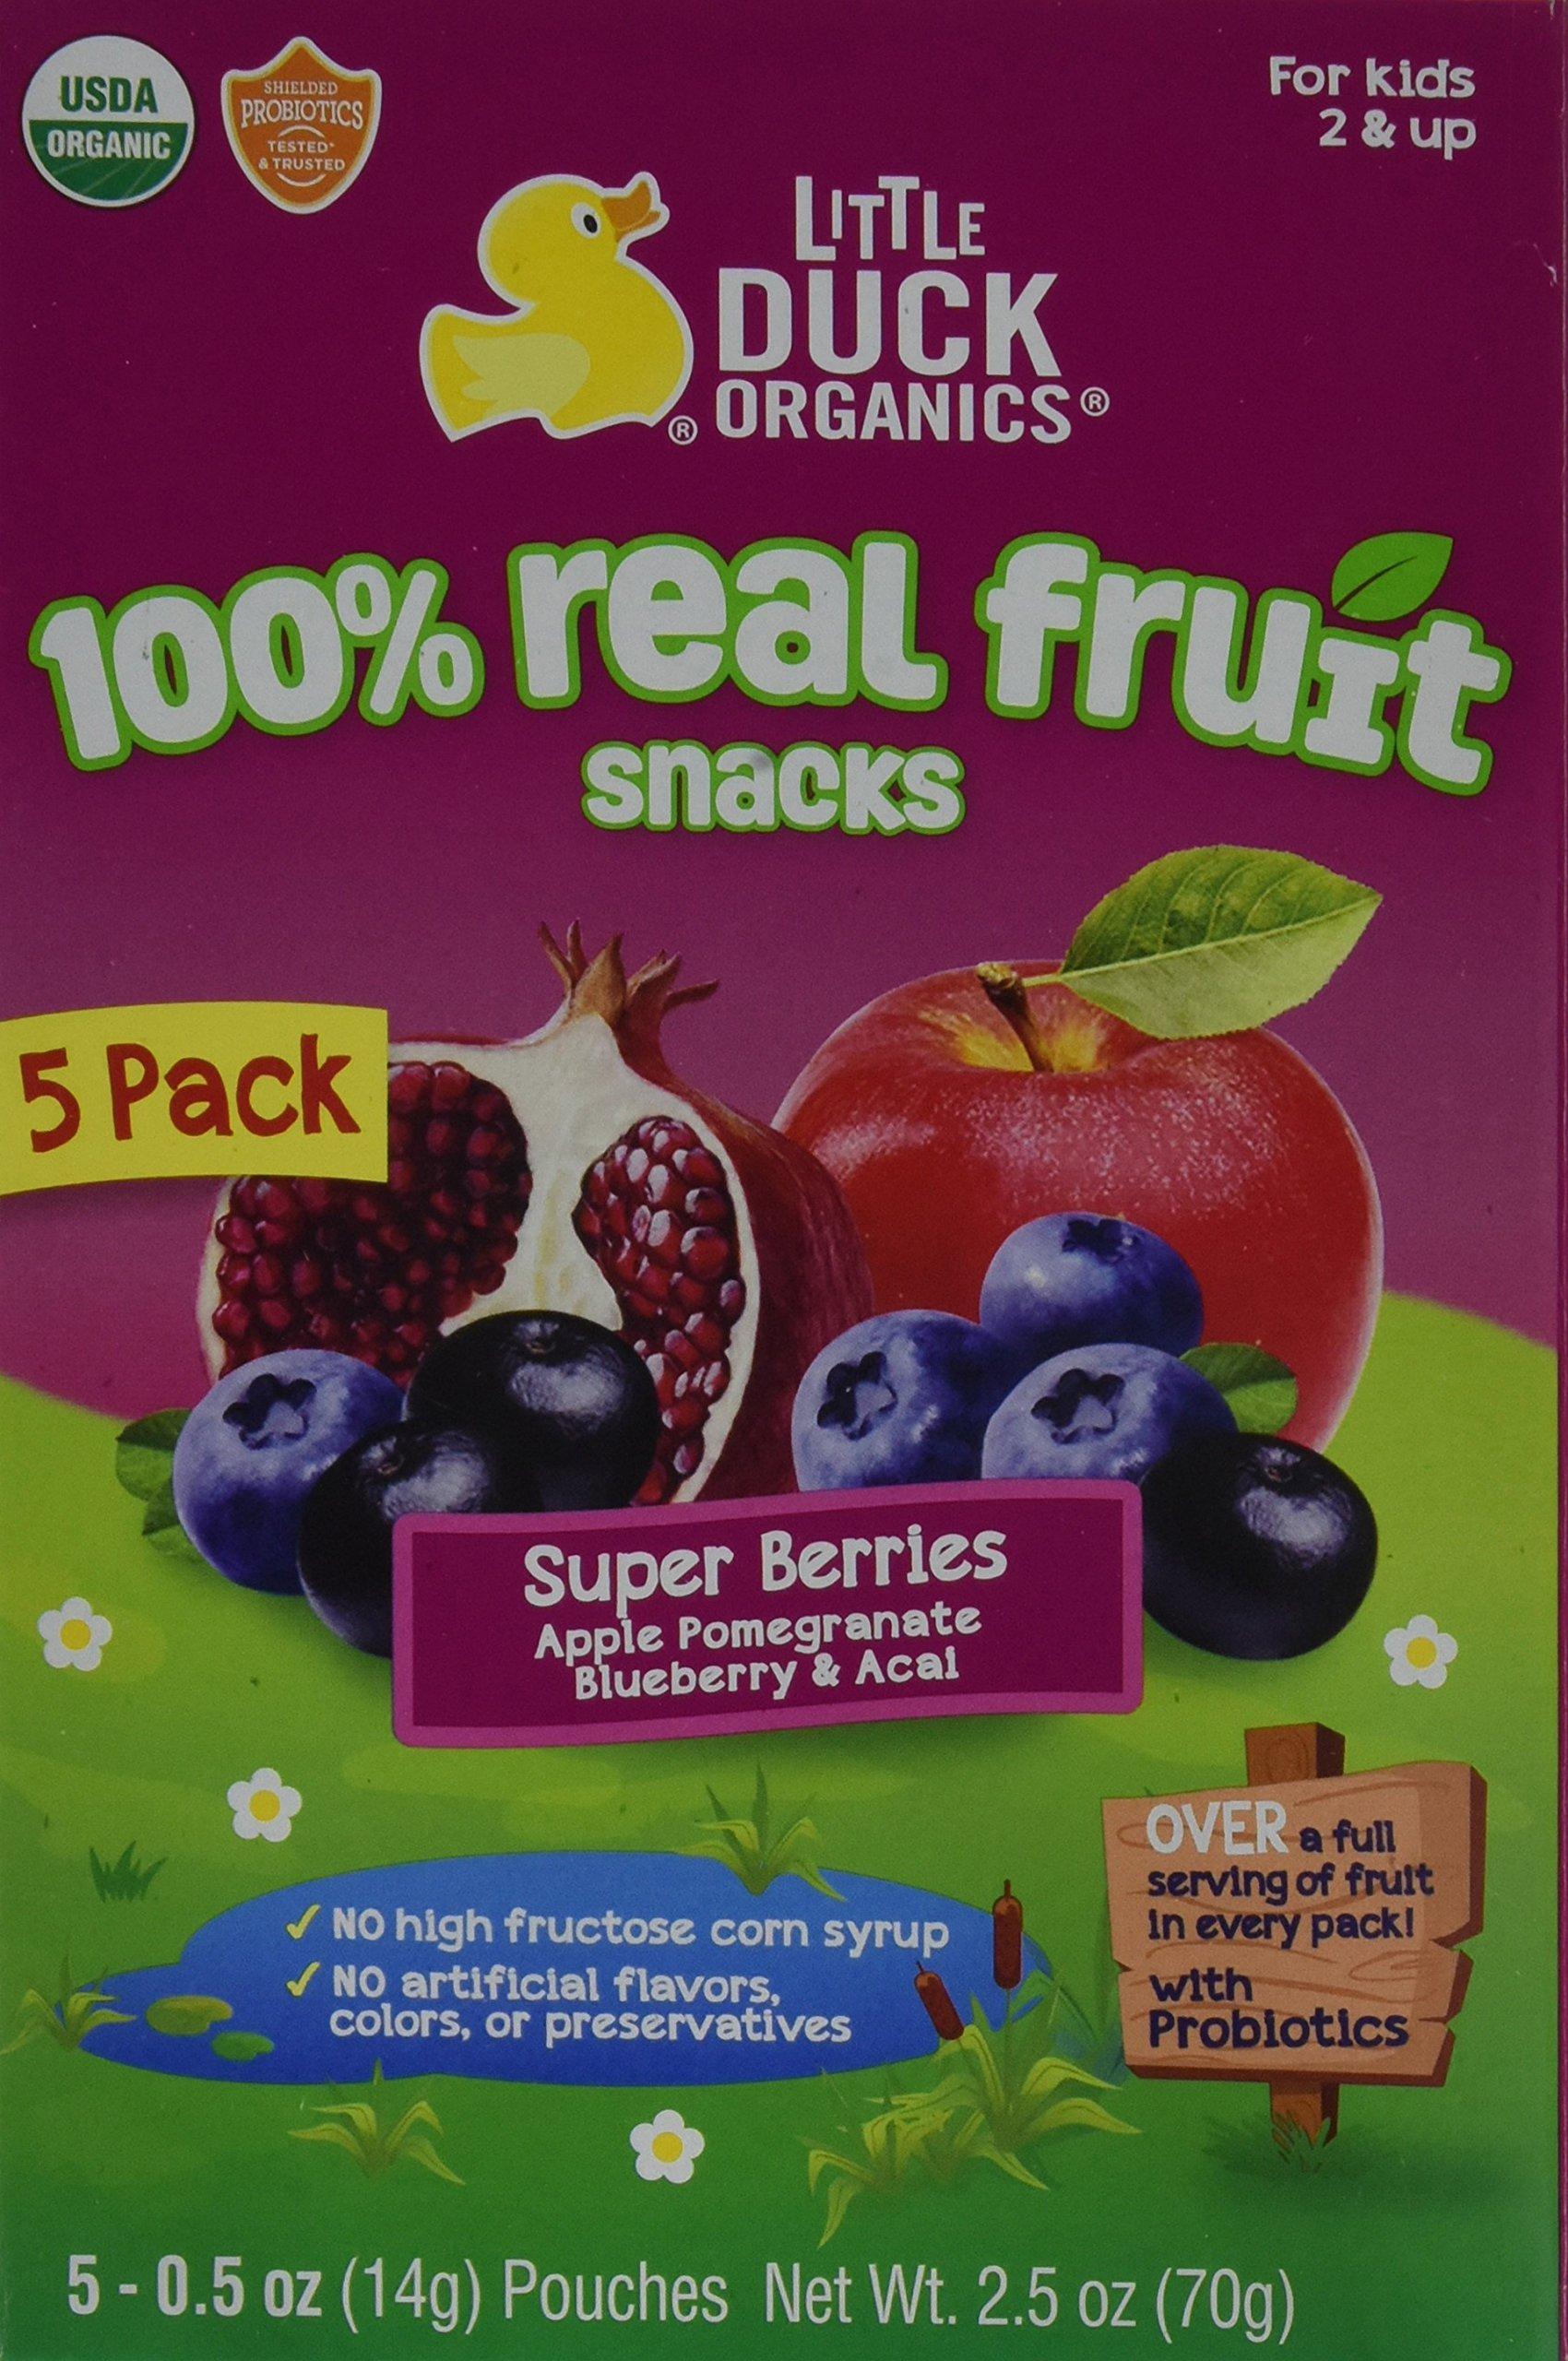 Little Duck Organics Gummies Pomp Blueberry Acai, 2.5 oz